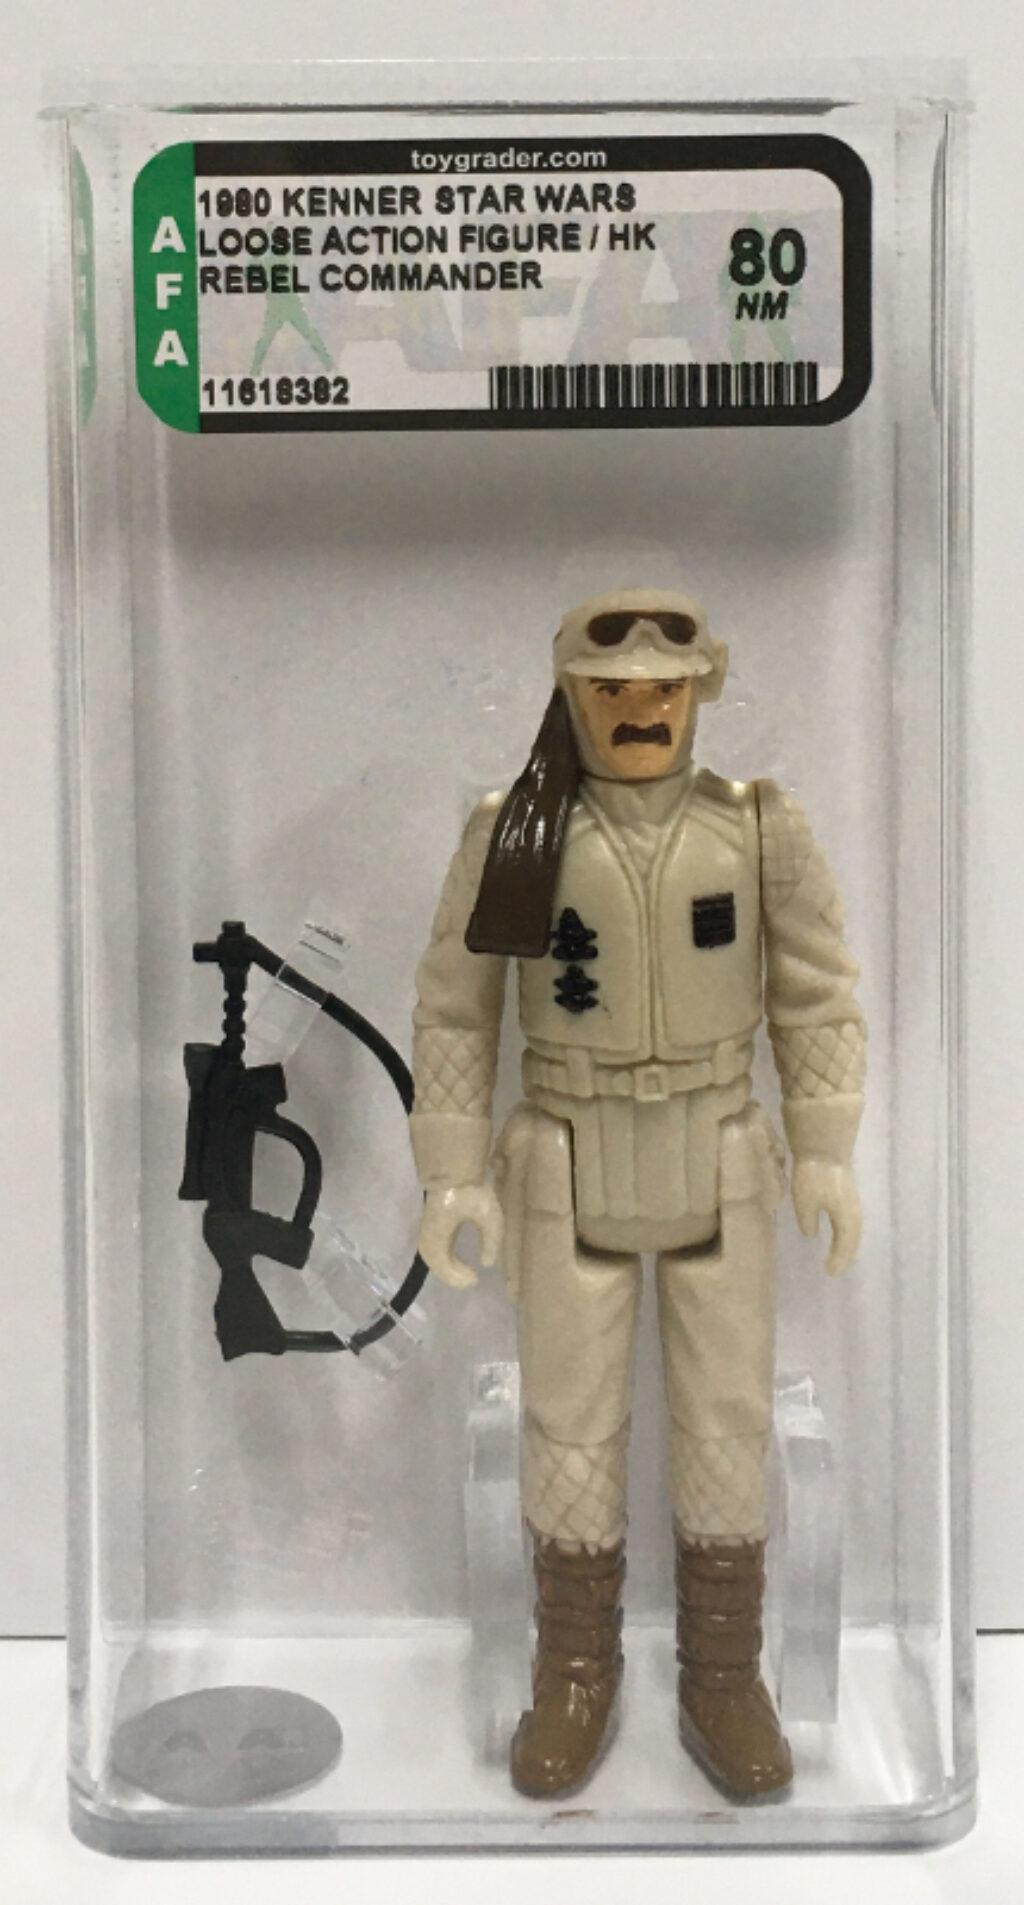 afa graded kenner star wars rebel commander 1